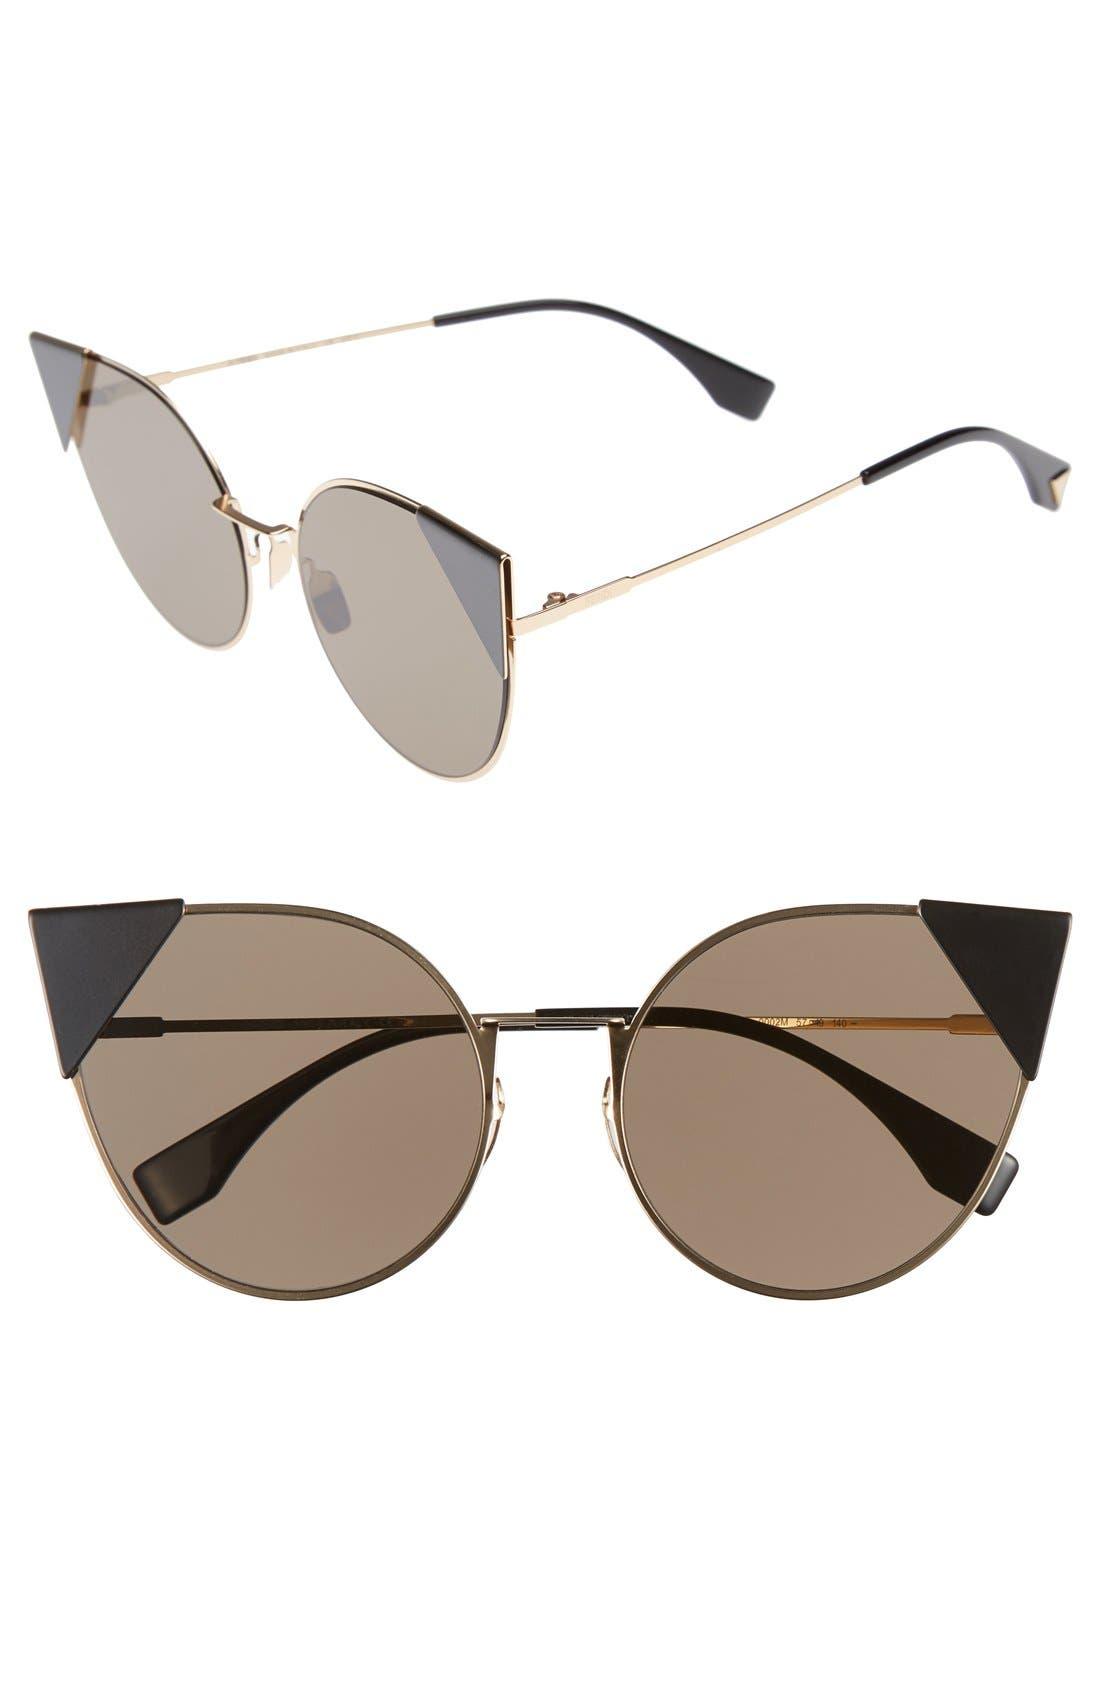 Main Image - Fendi 57mm Lei Cat Eye Sunglasses